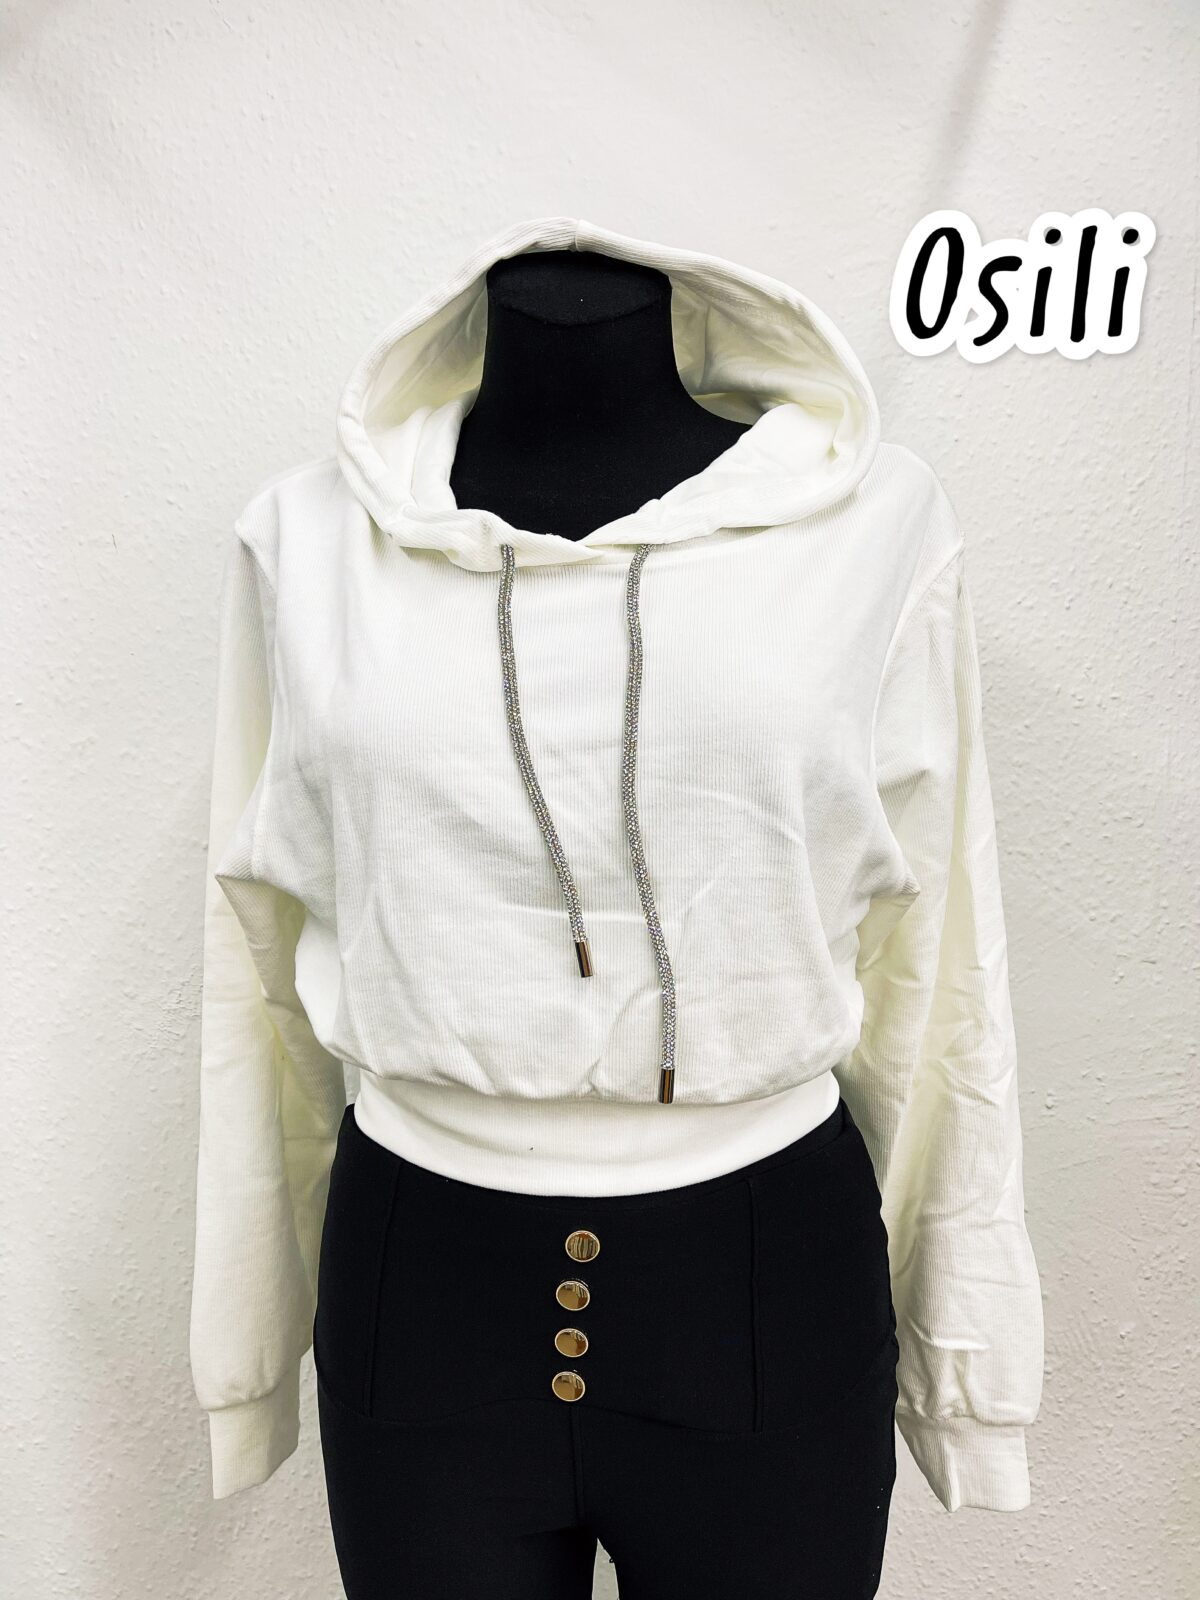 3D269A06 9F1E 4269 AC0F 767D2650F50C scaled Osili - Fashion - Divat